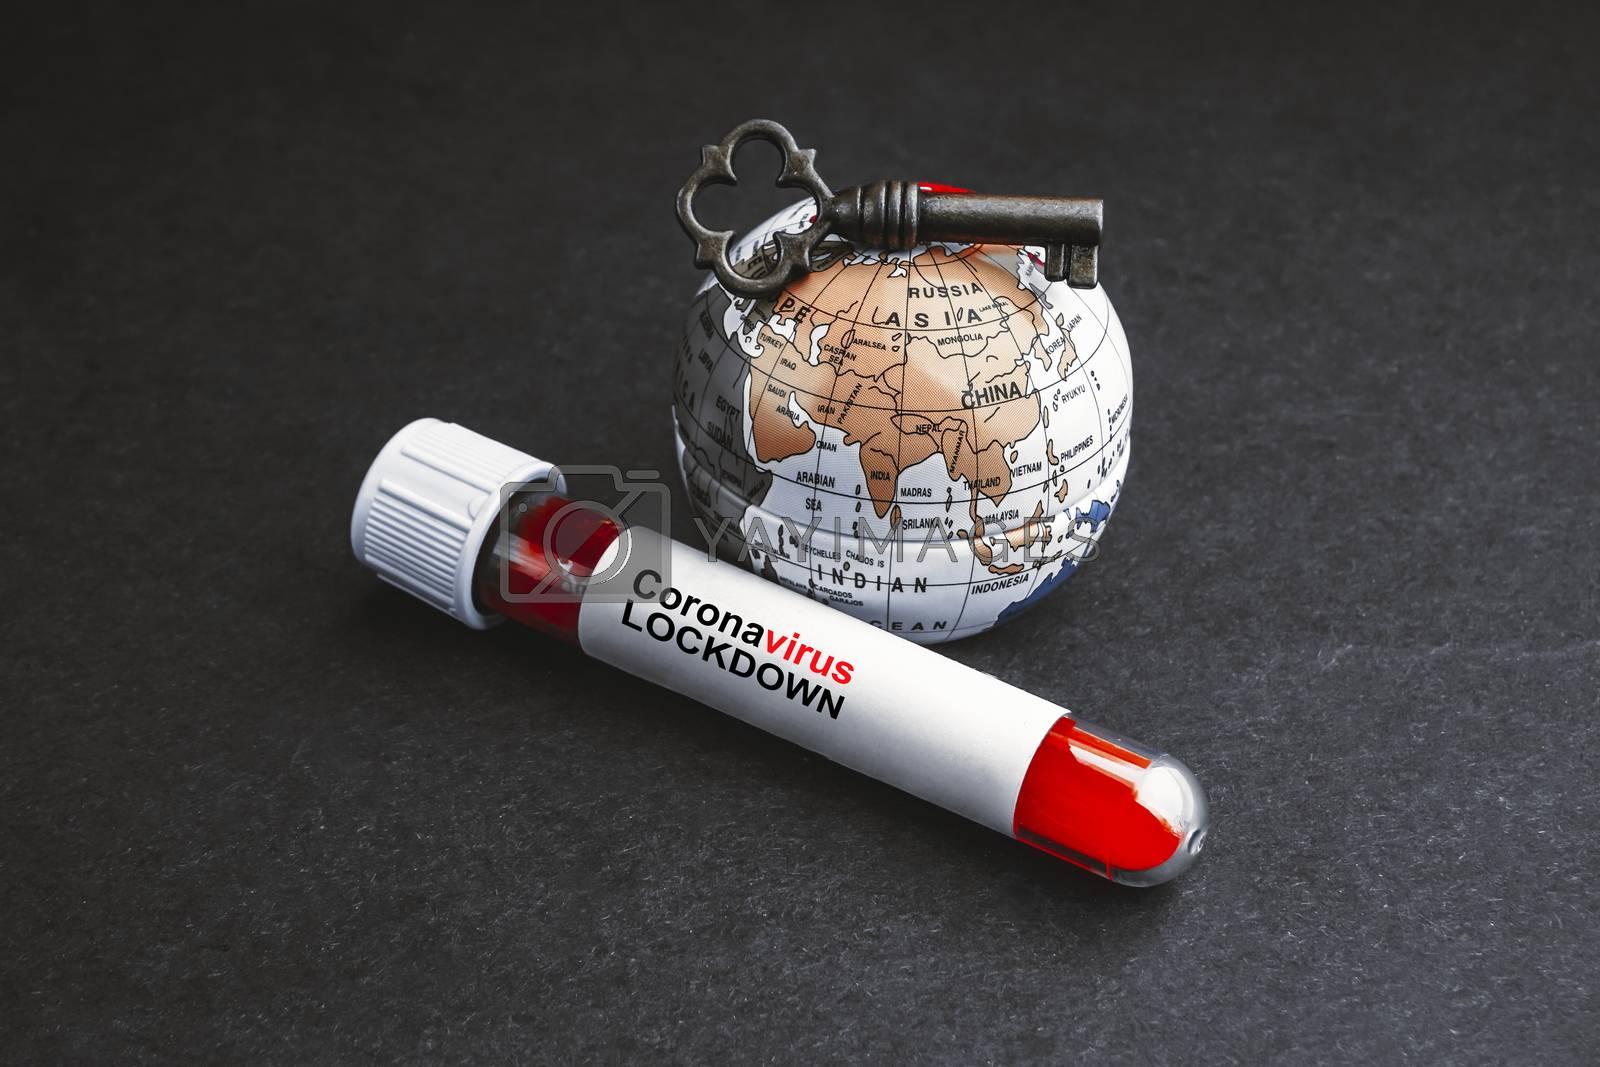 CORONAVIRUS LOCKDOWN text with world globe, key and Blood test vacuum tube on black background. Covid-19 or Coronavirus Concept